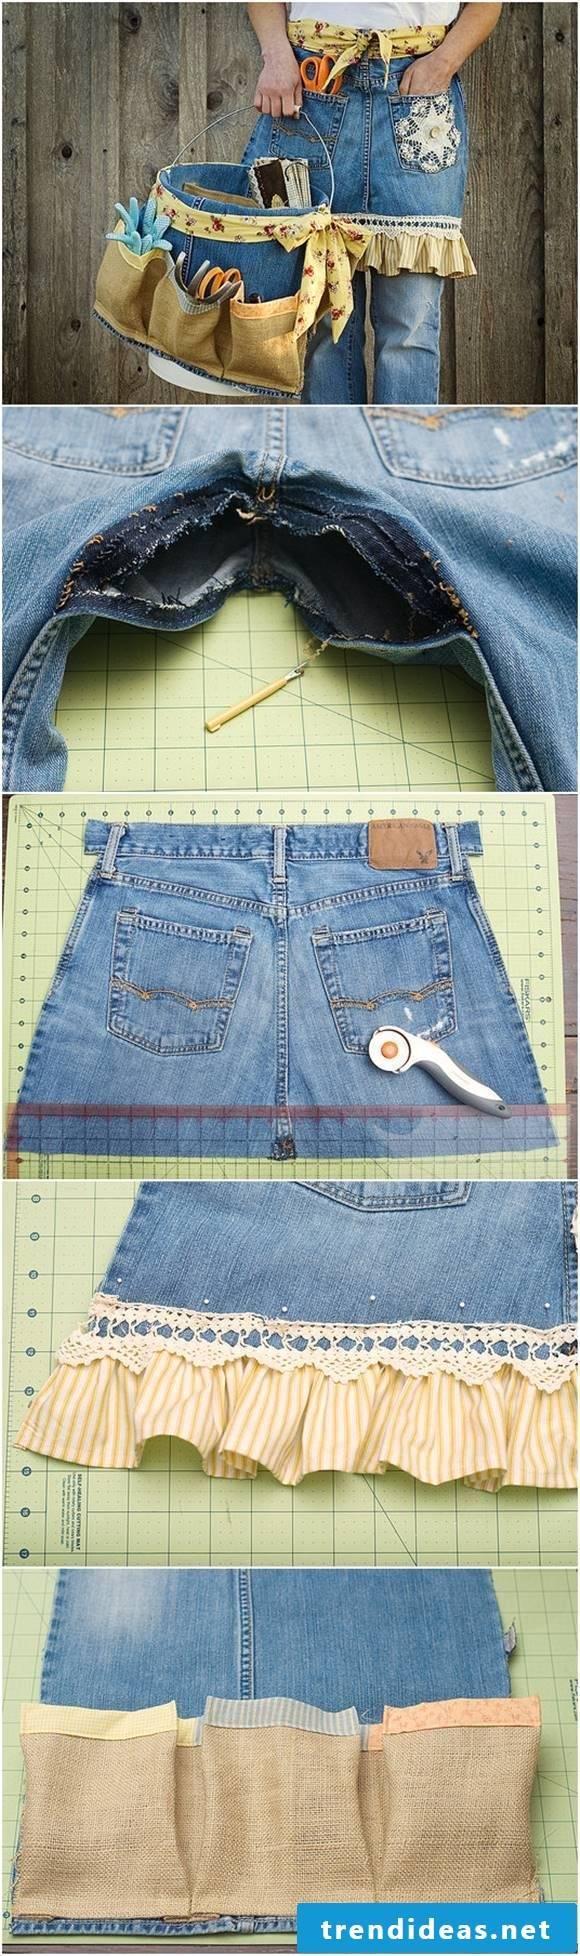 Sew apron